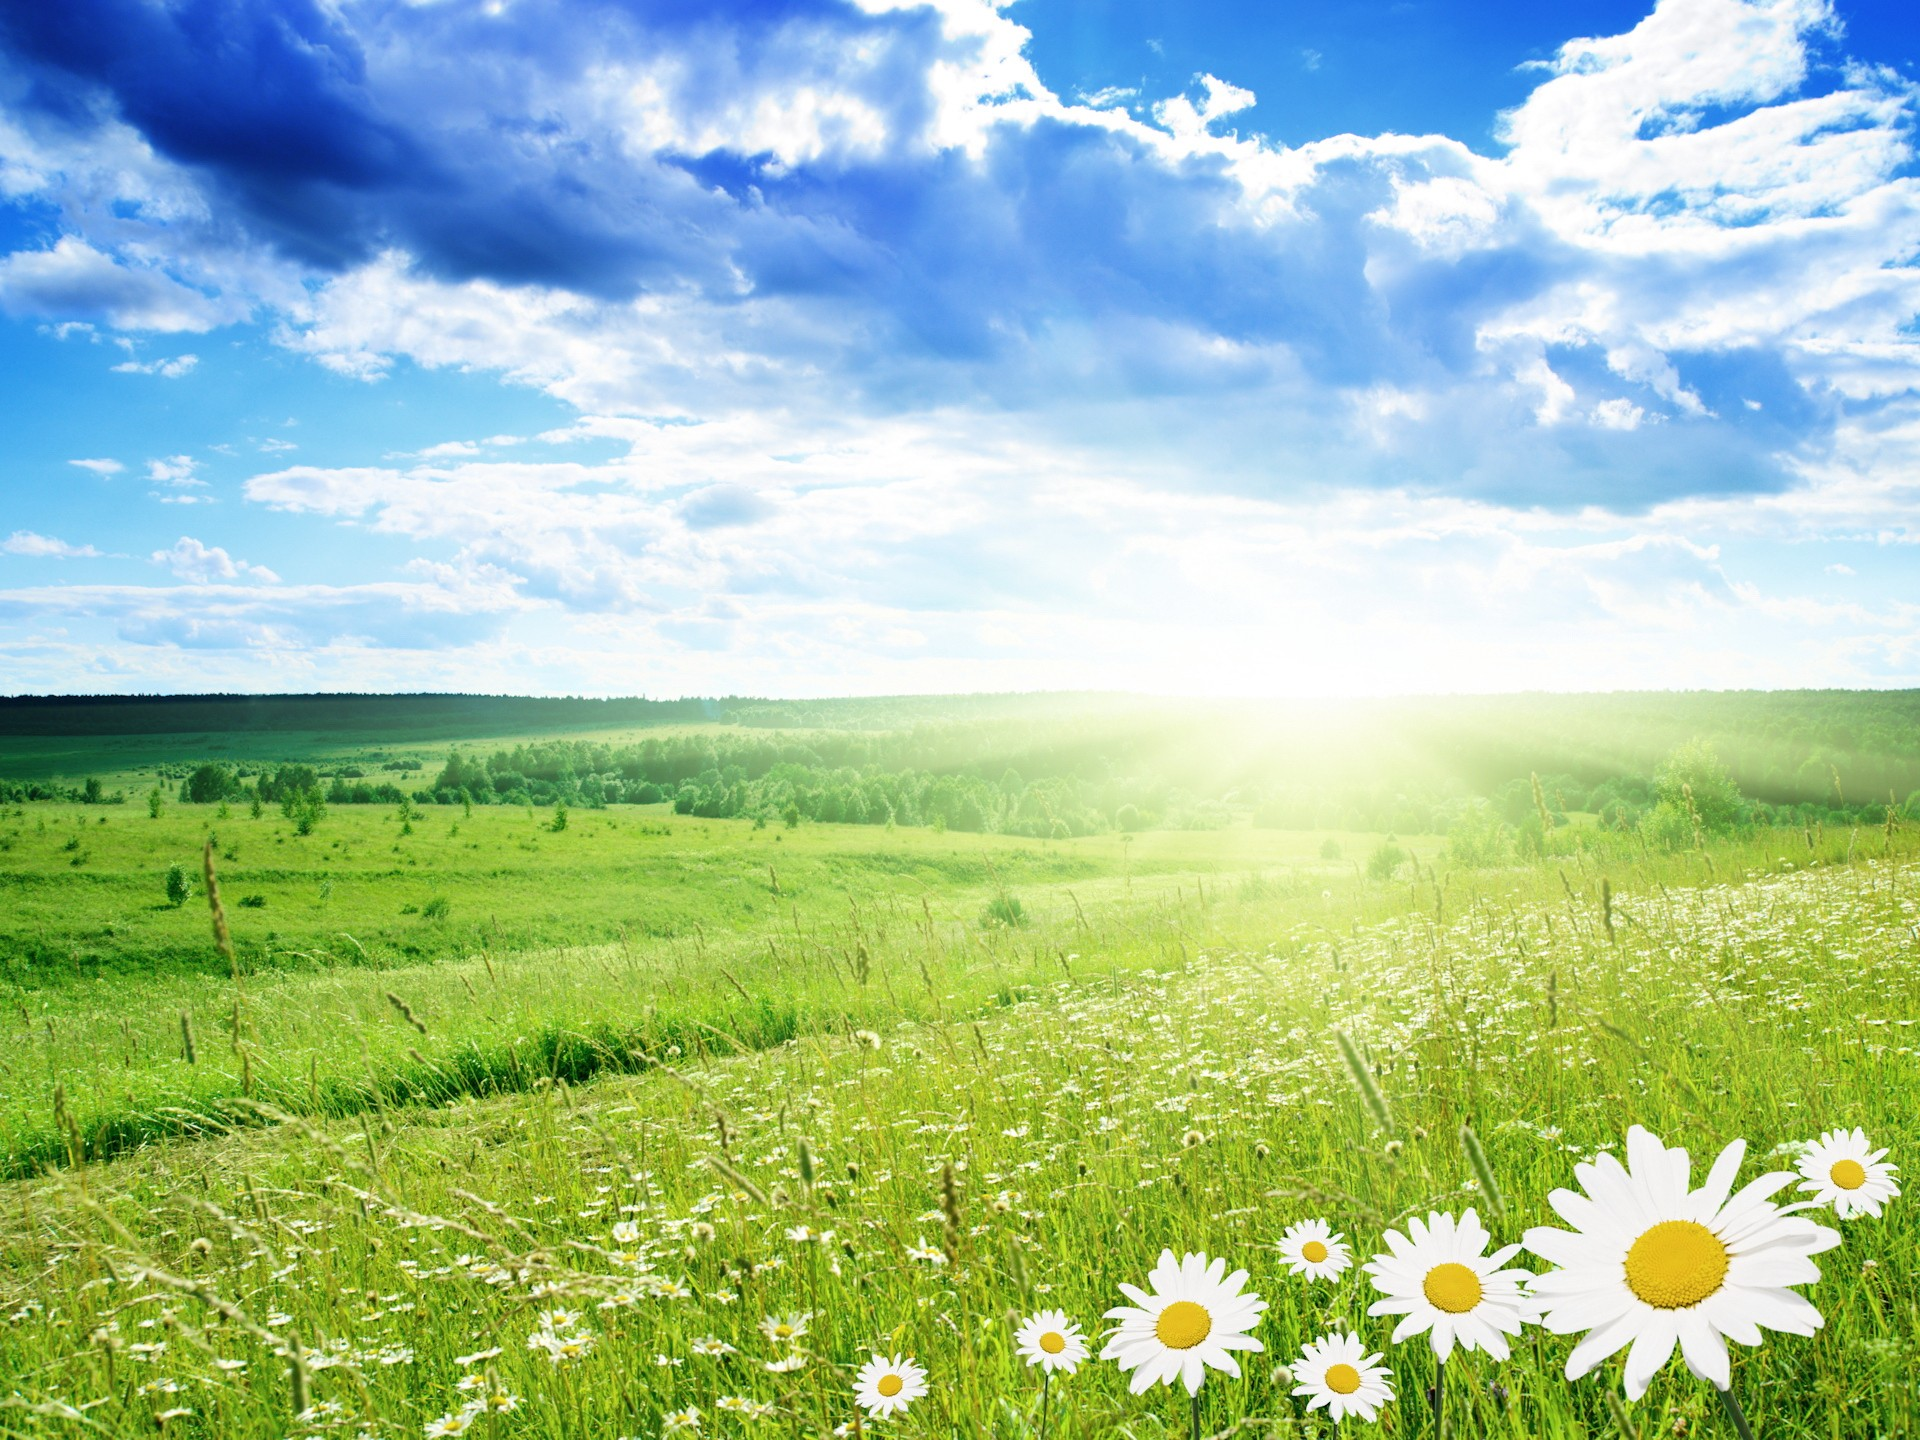 Природа пейзаж весна ромашки поле